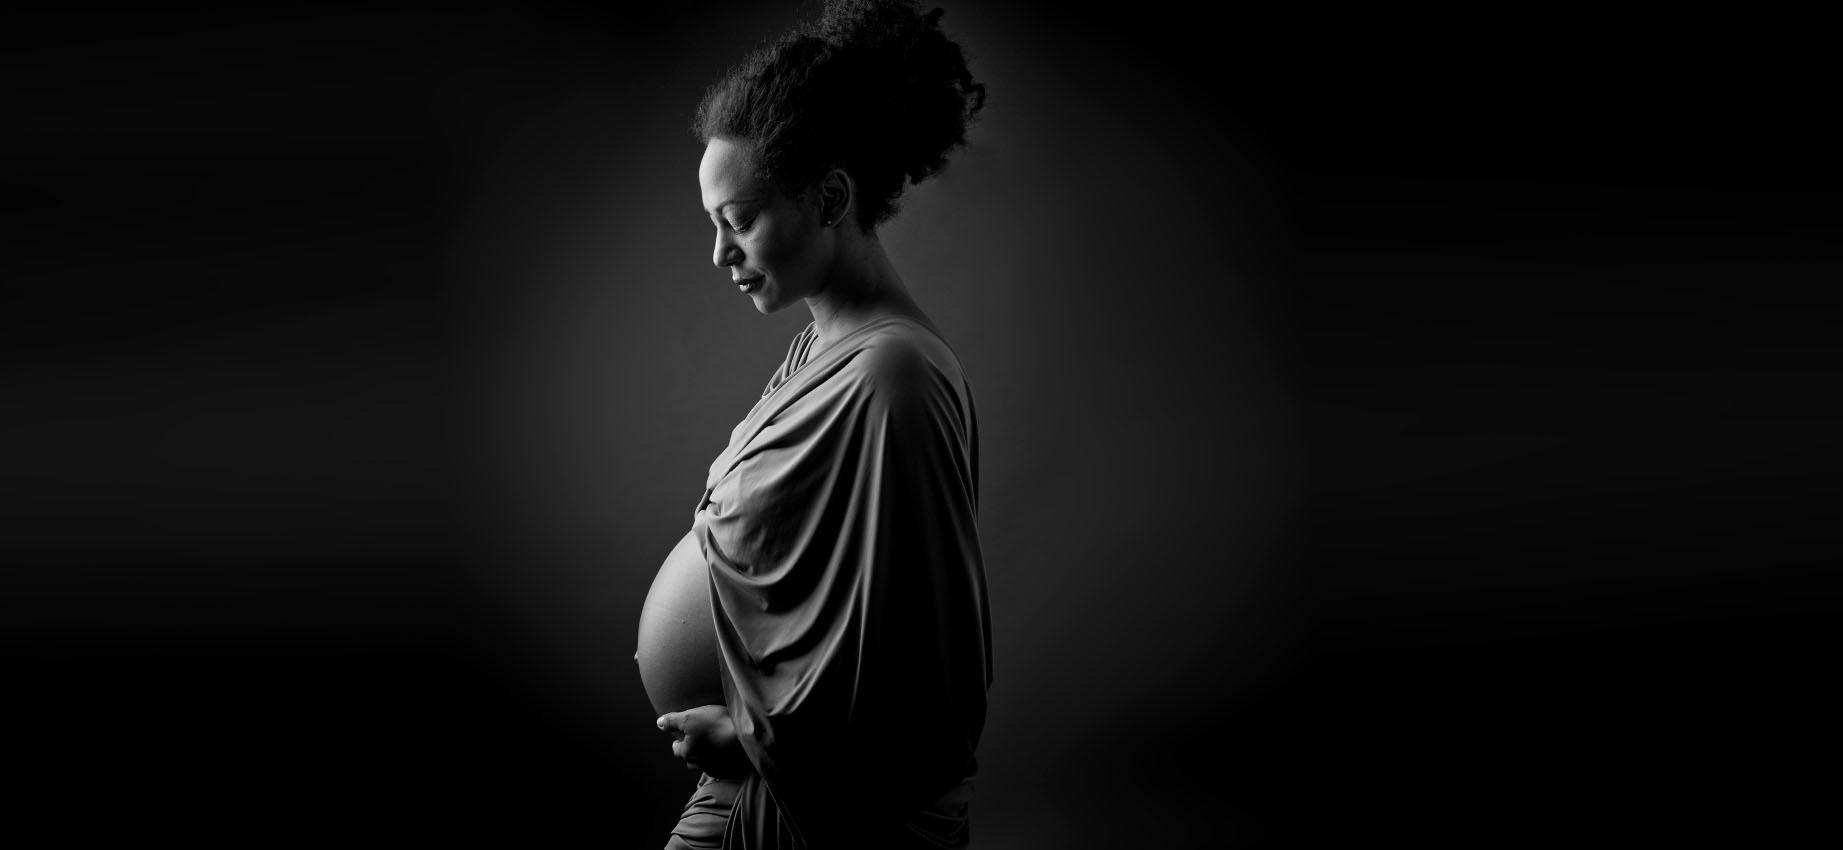 Frau, schwarz, schwanger, portrait, Düsseldorf